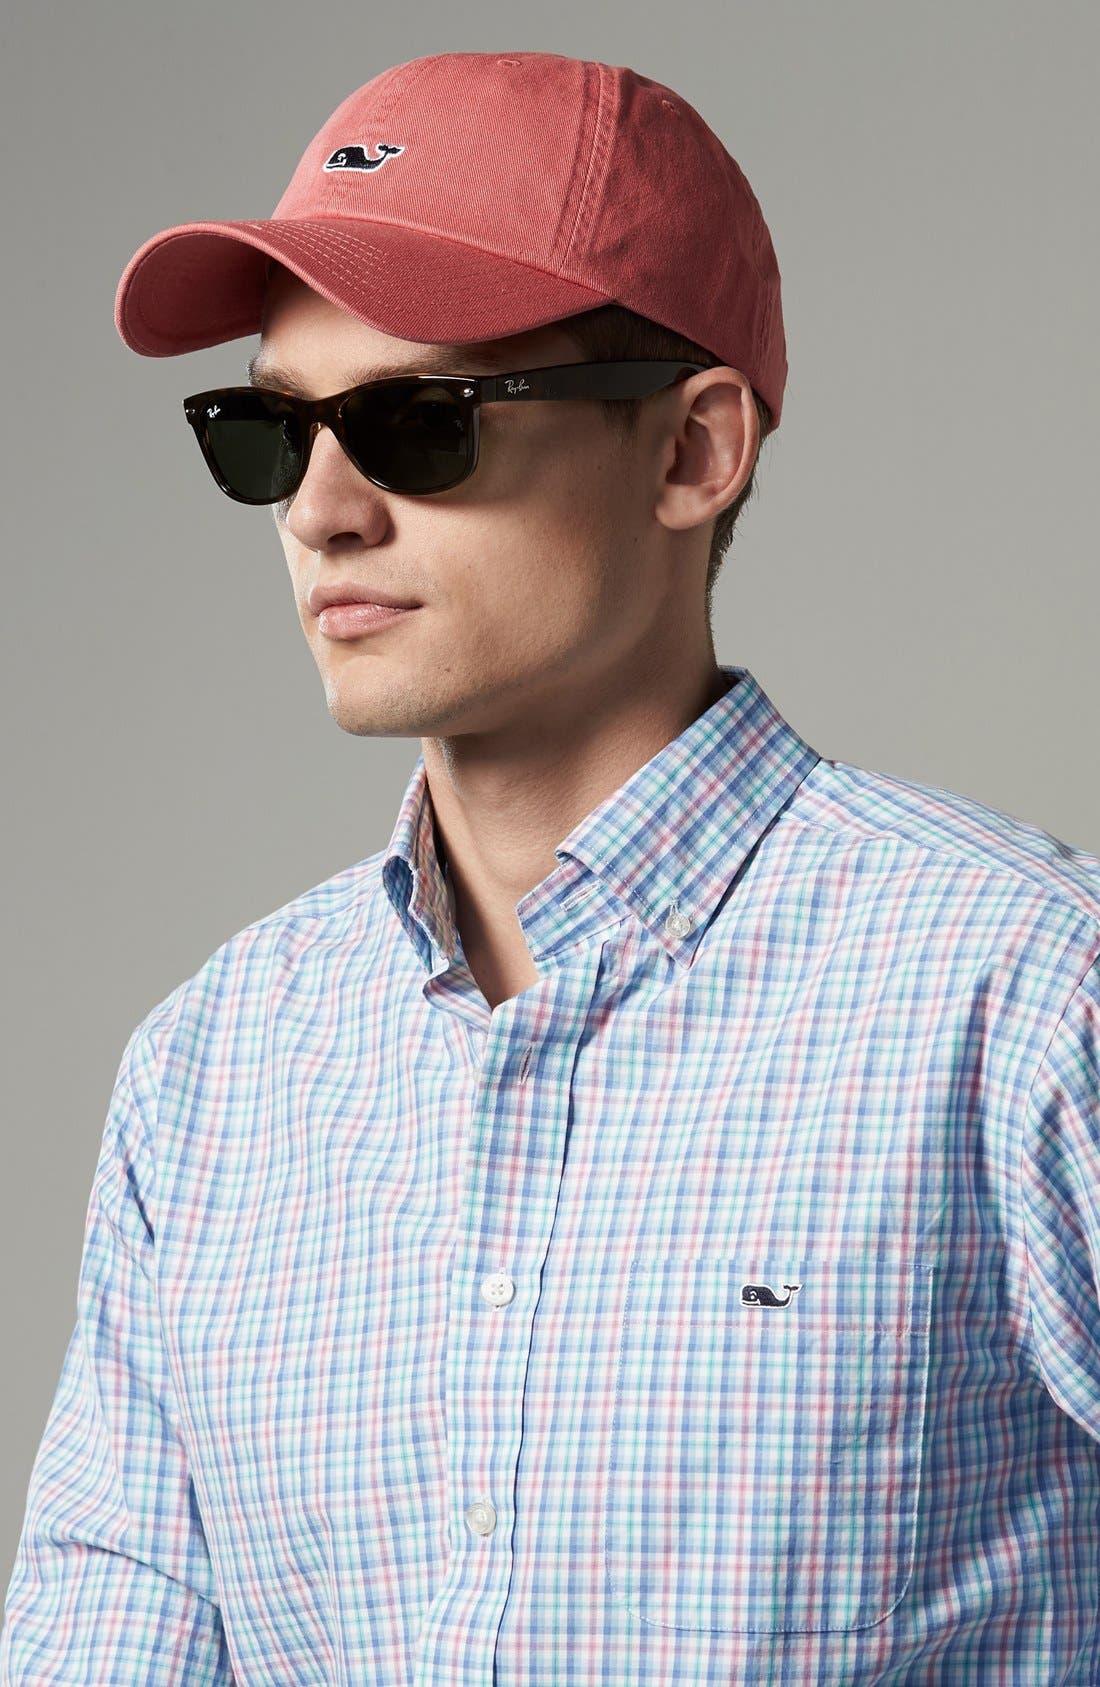 RAY-BAN, 'New Wayfarer' 55mm Sunglasses, Alternate thumbnail 2, color, TORTOISE/ GREEN